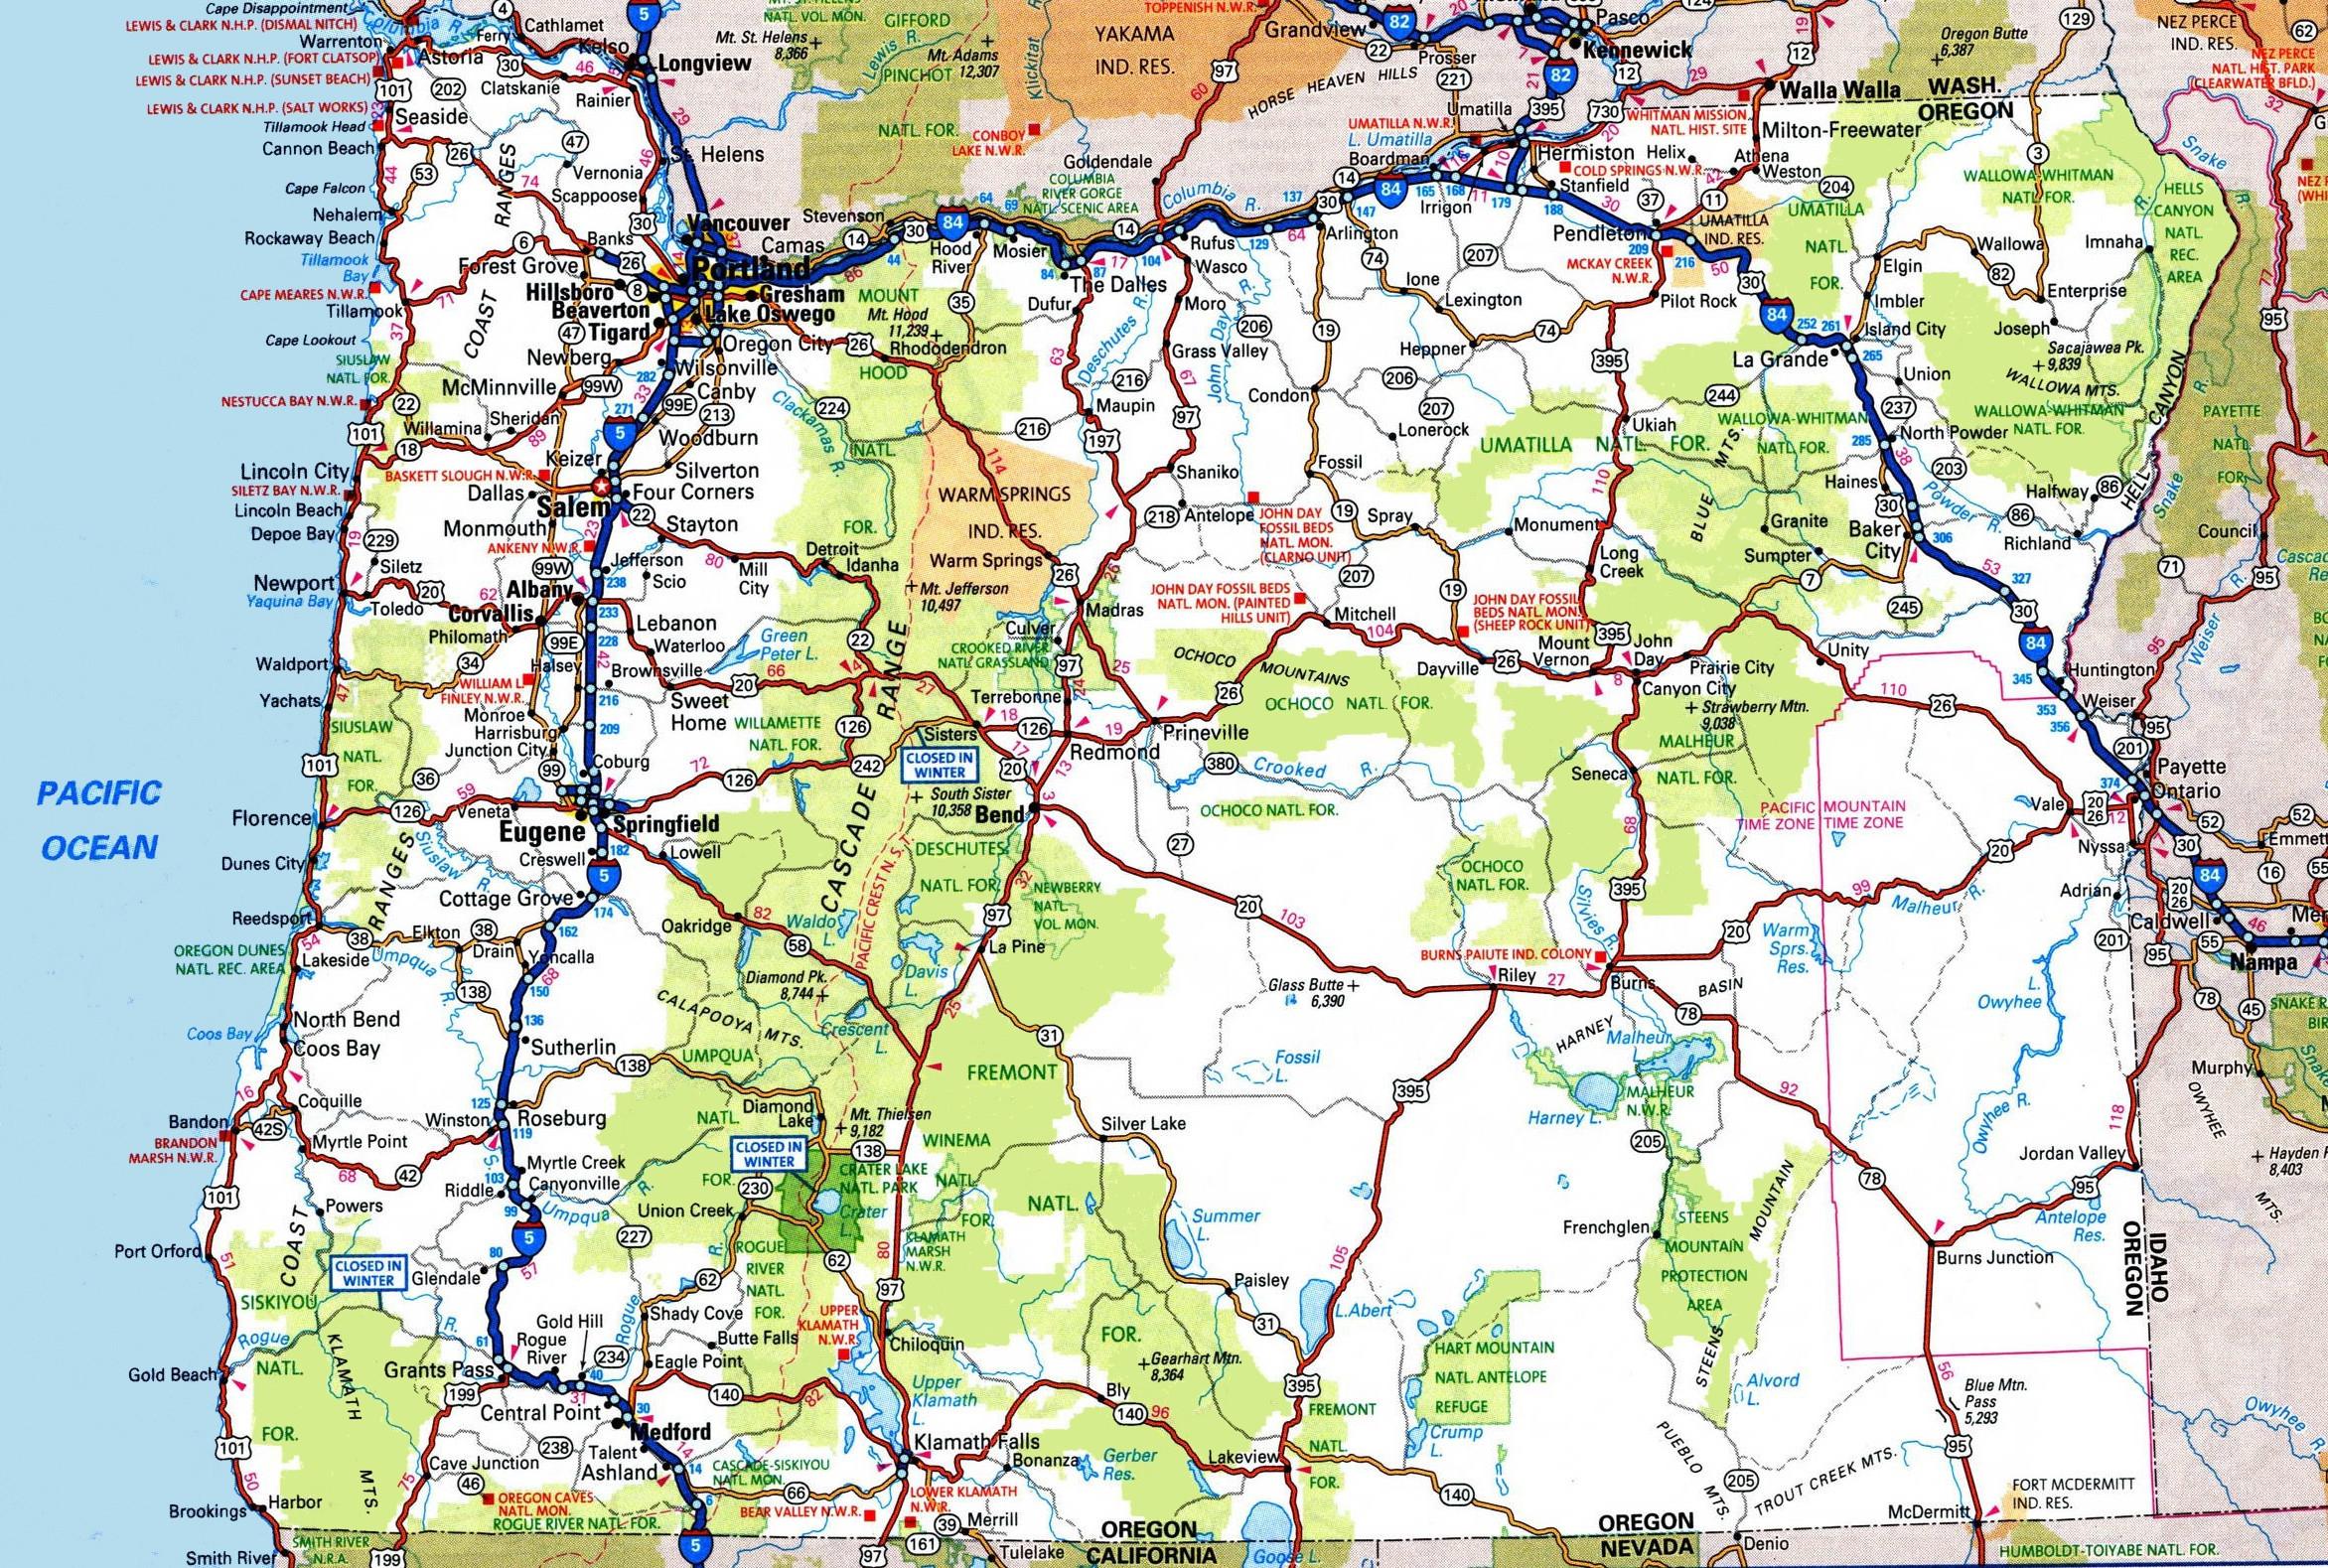 Road Map Of Nevada And California Printable Maps Map California Map - Road Map Of California And Nevada